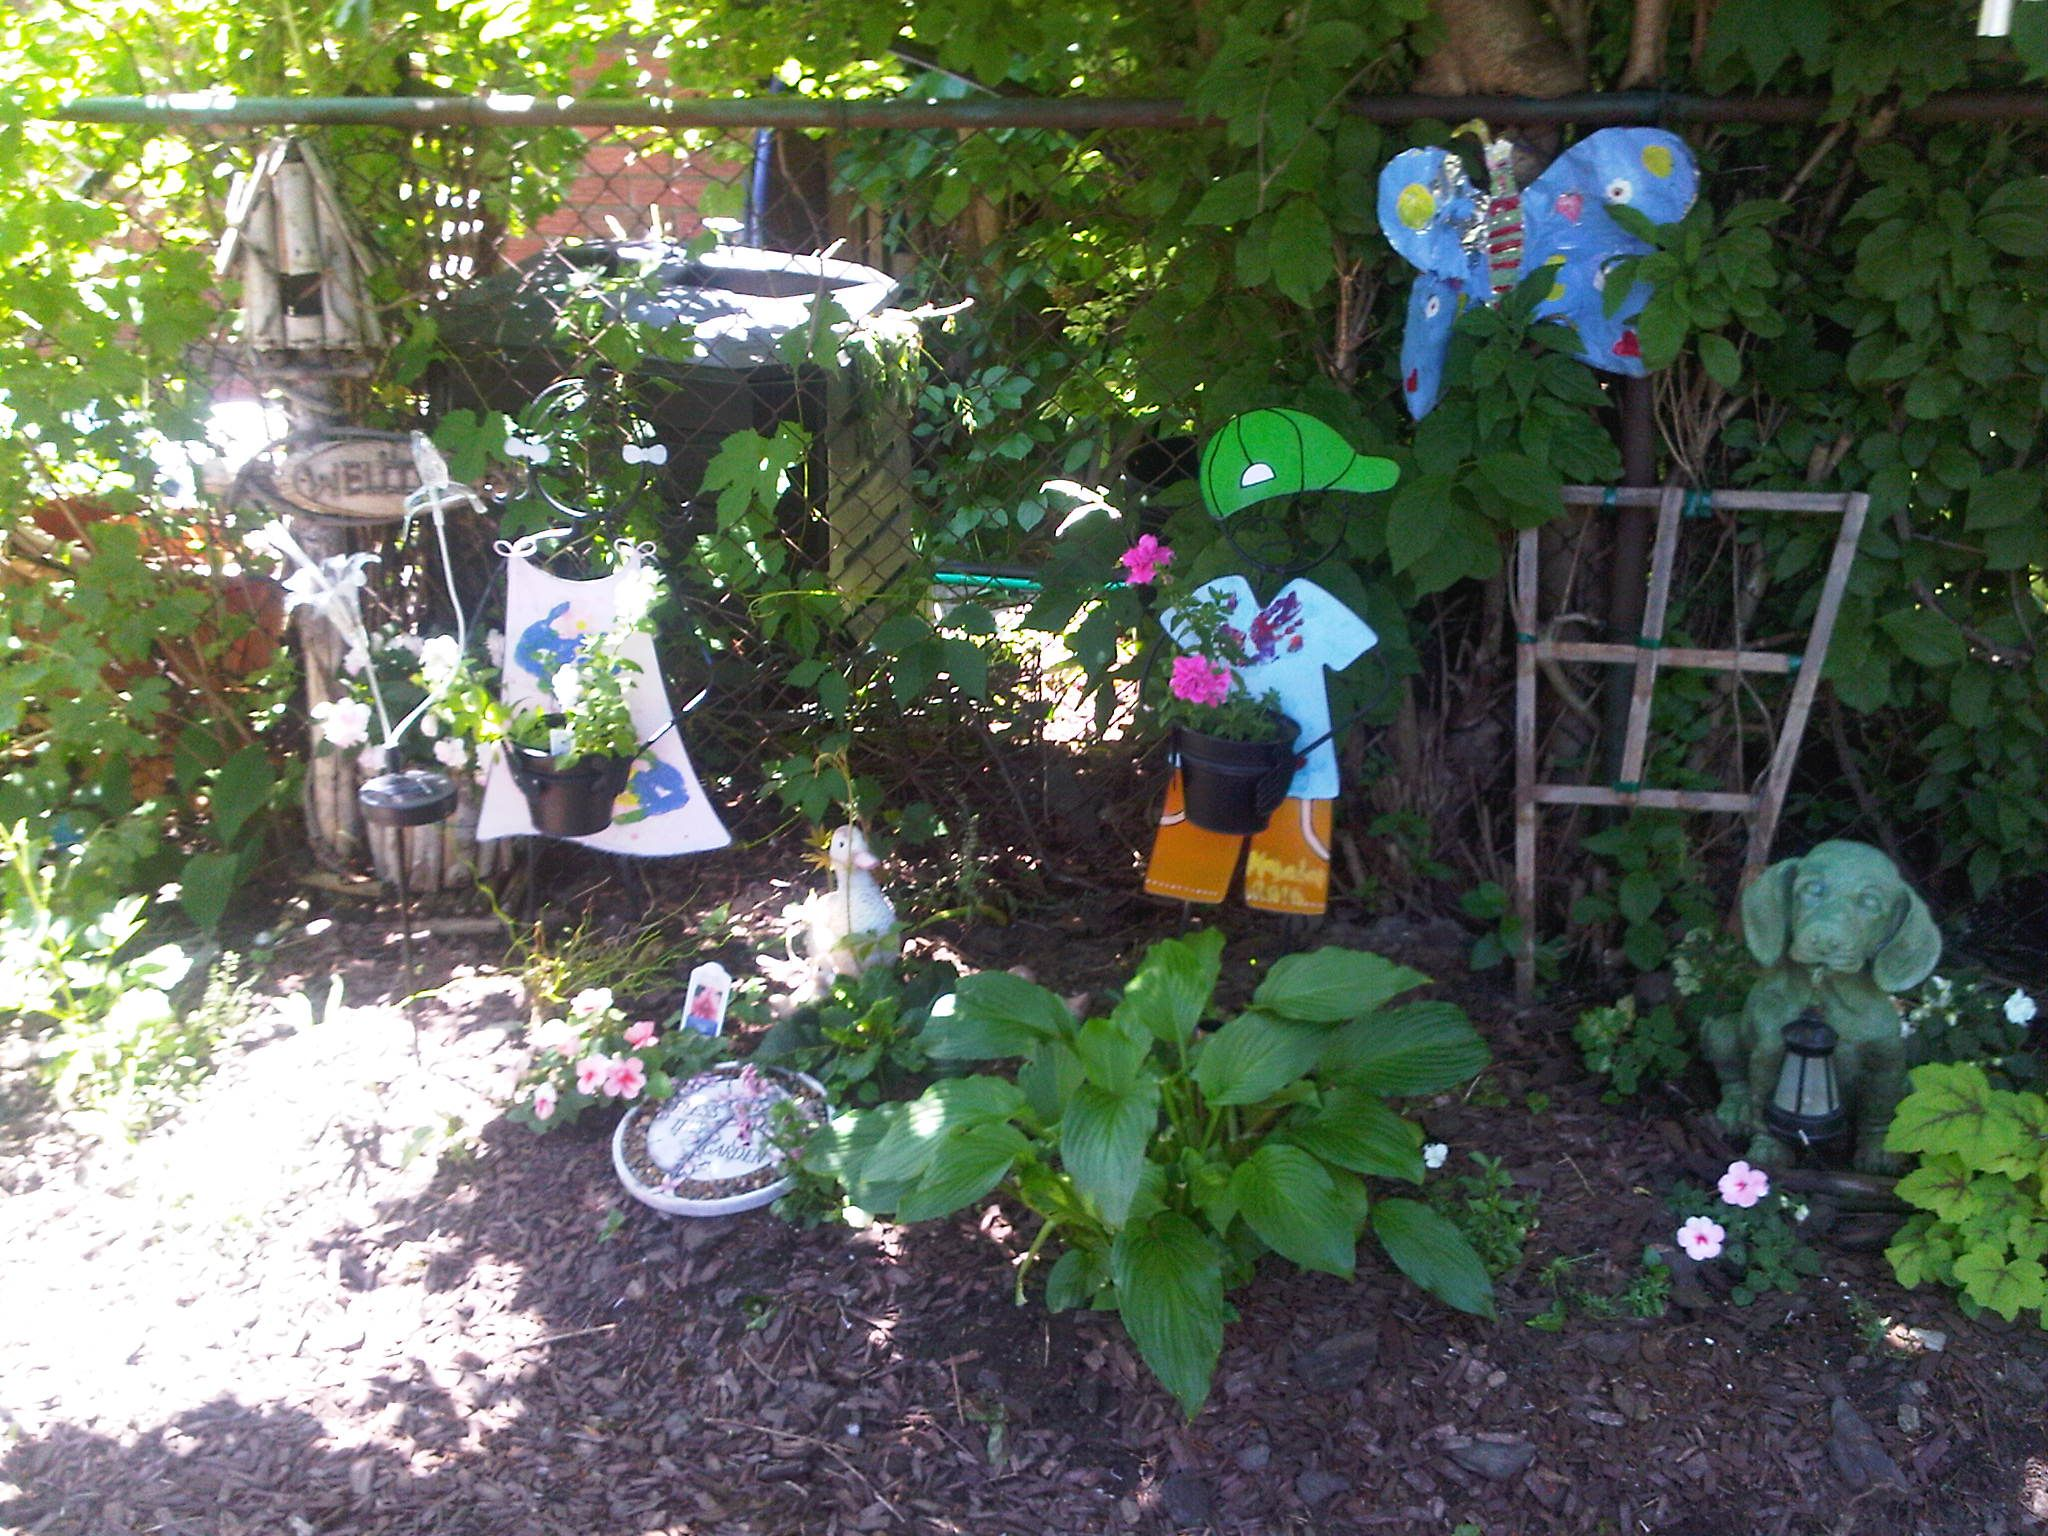 my grandchildrens garden in my backyard 2011 gardening